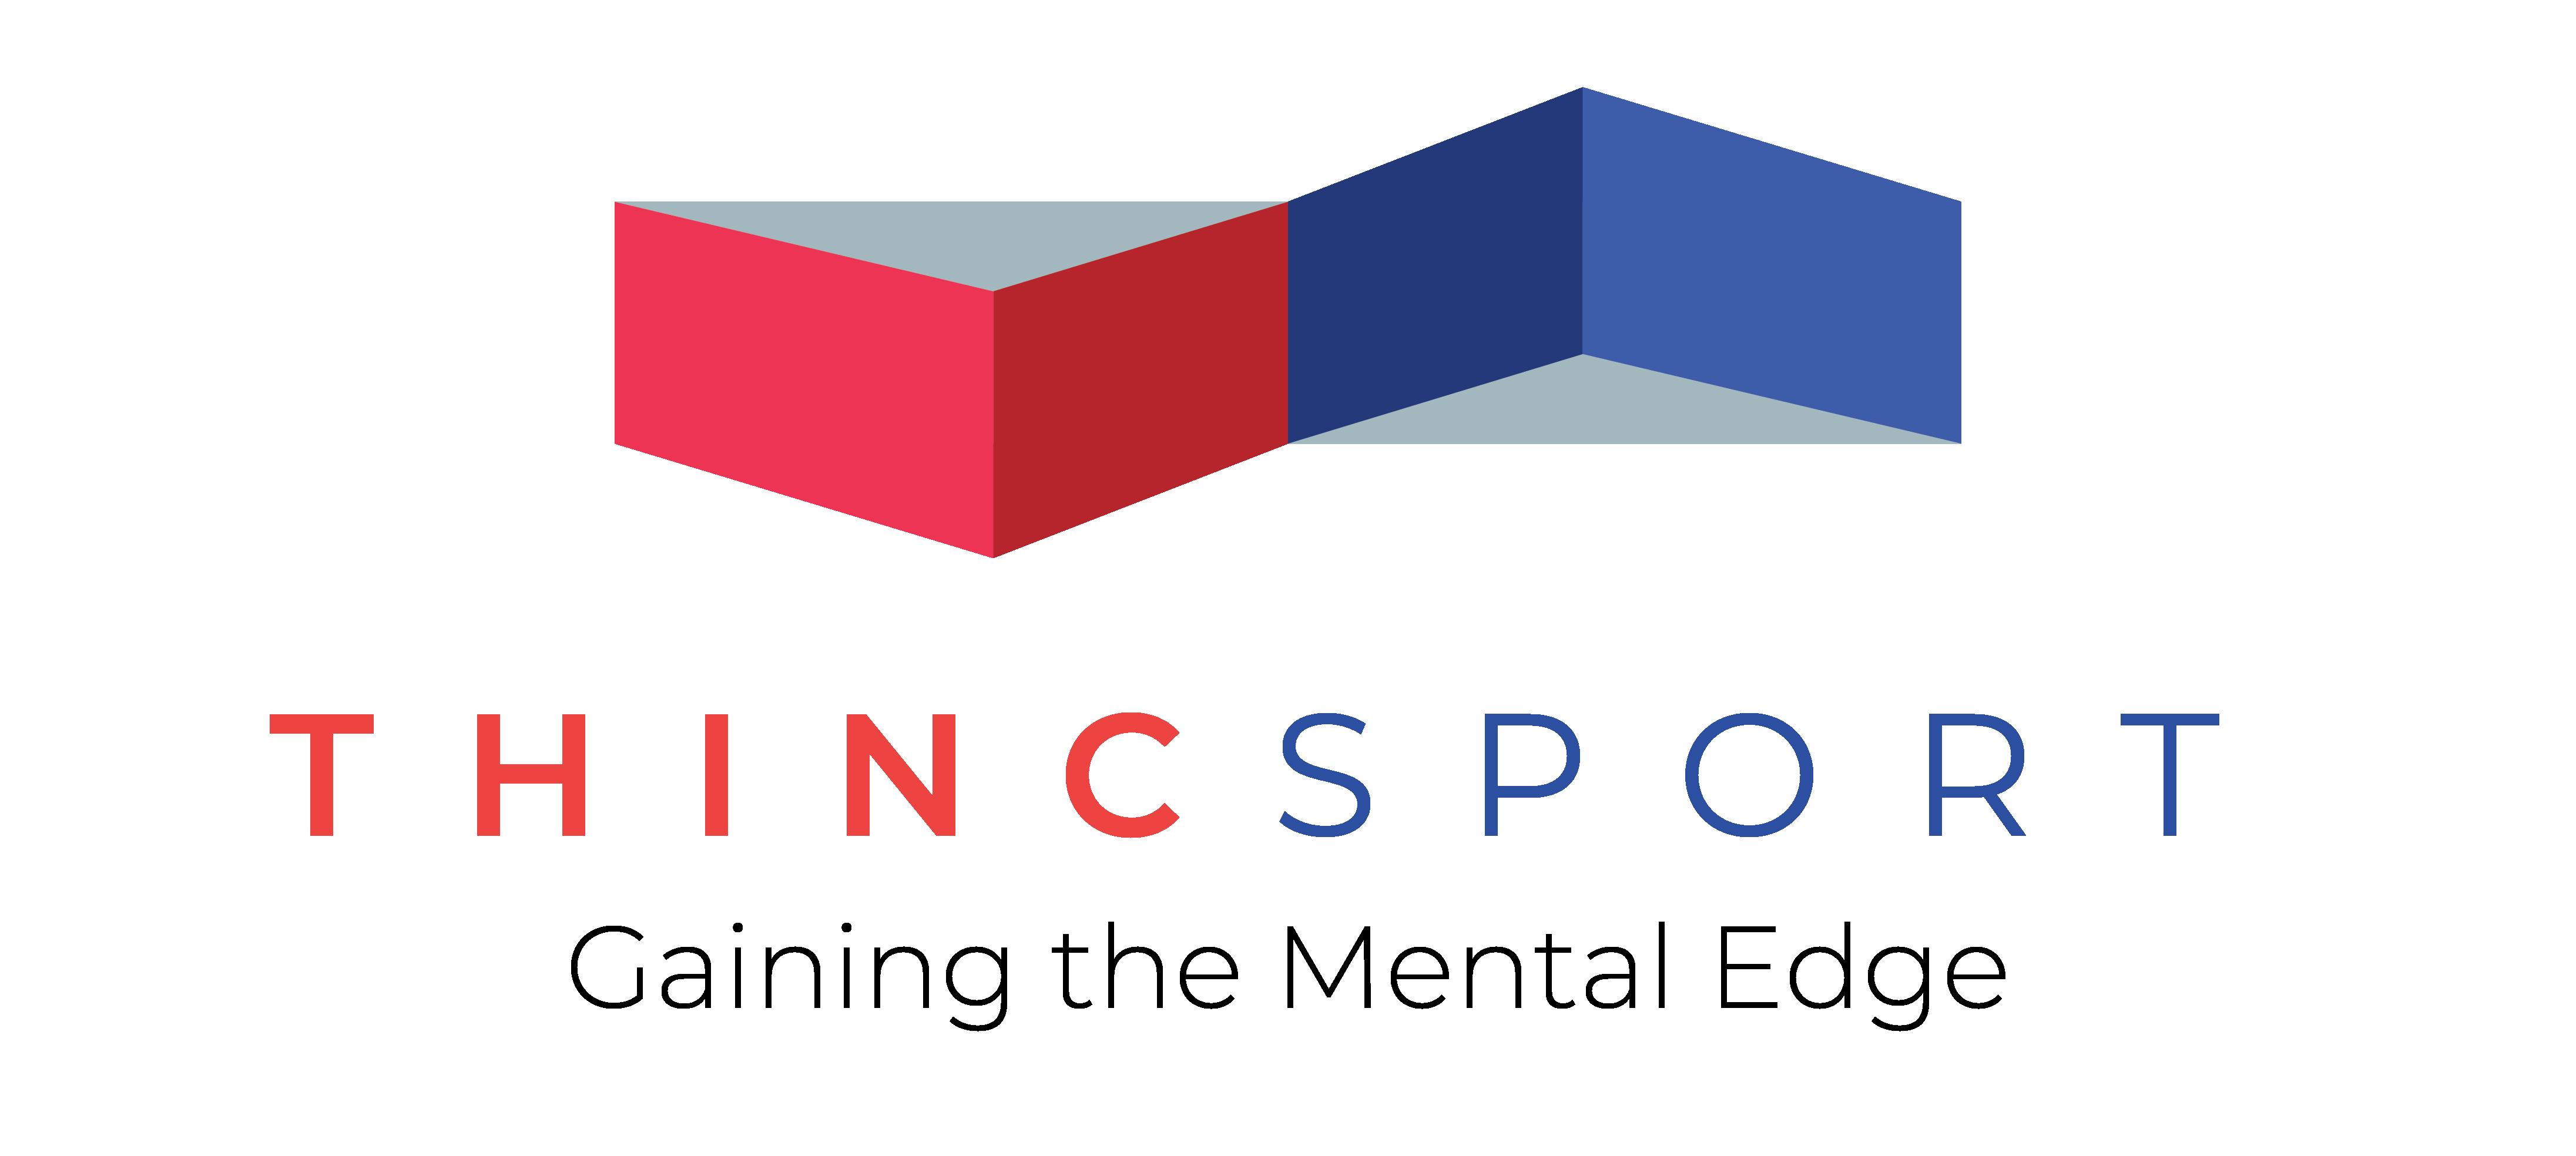 ThincSport